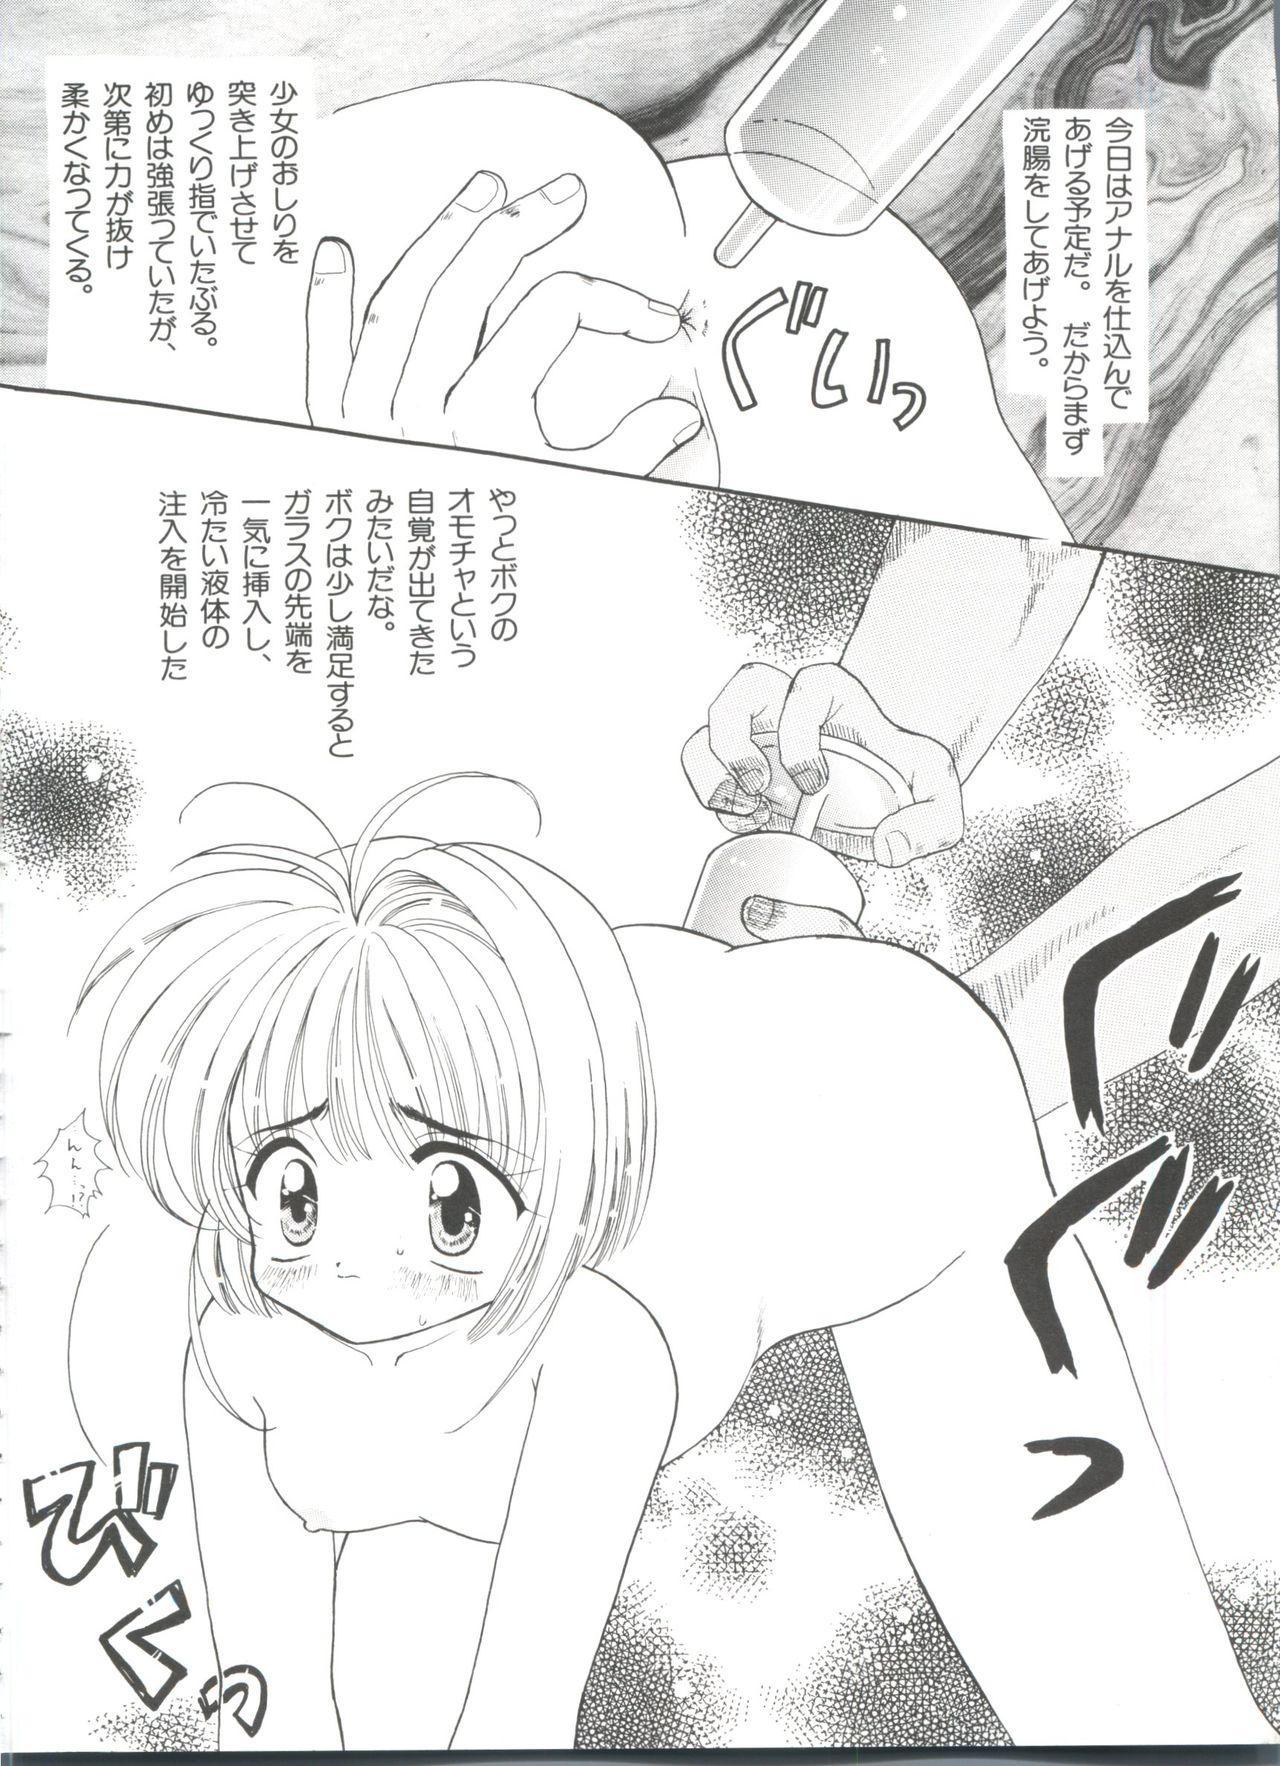 Ero-chan to Issho 3 103